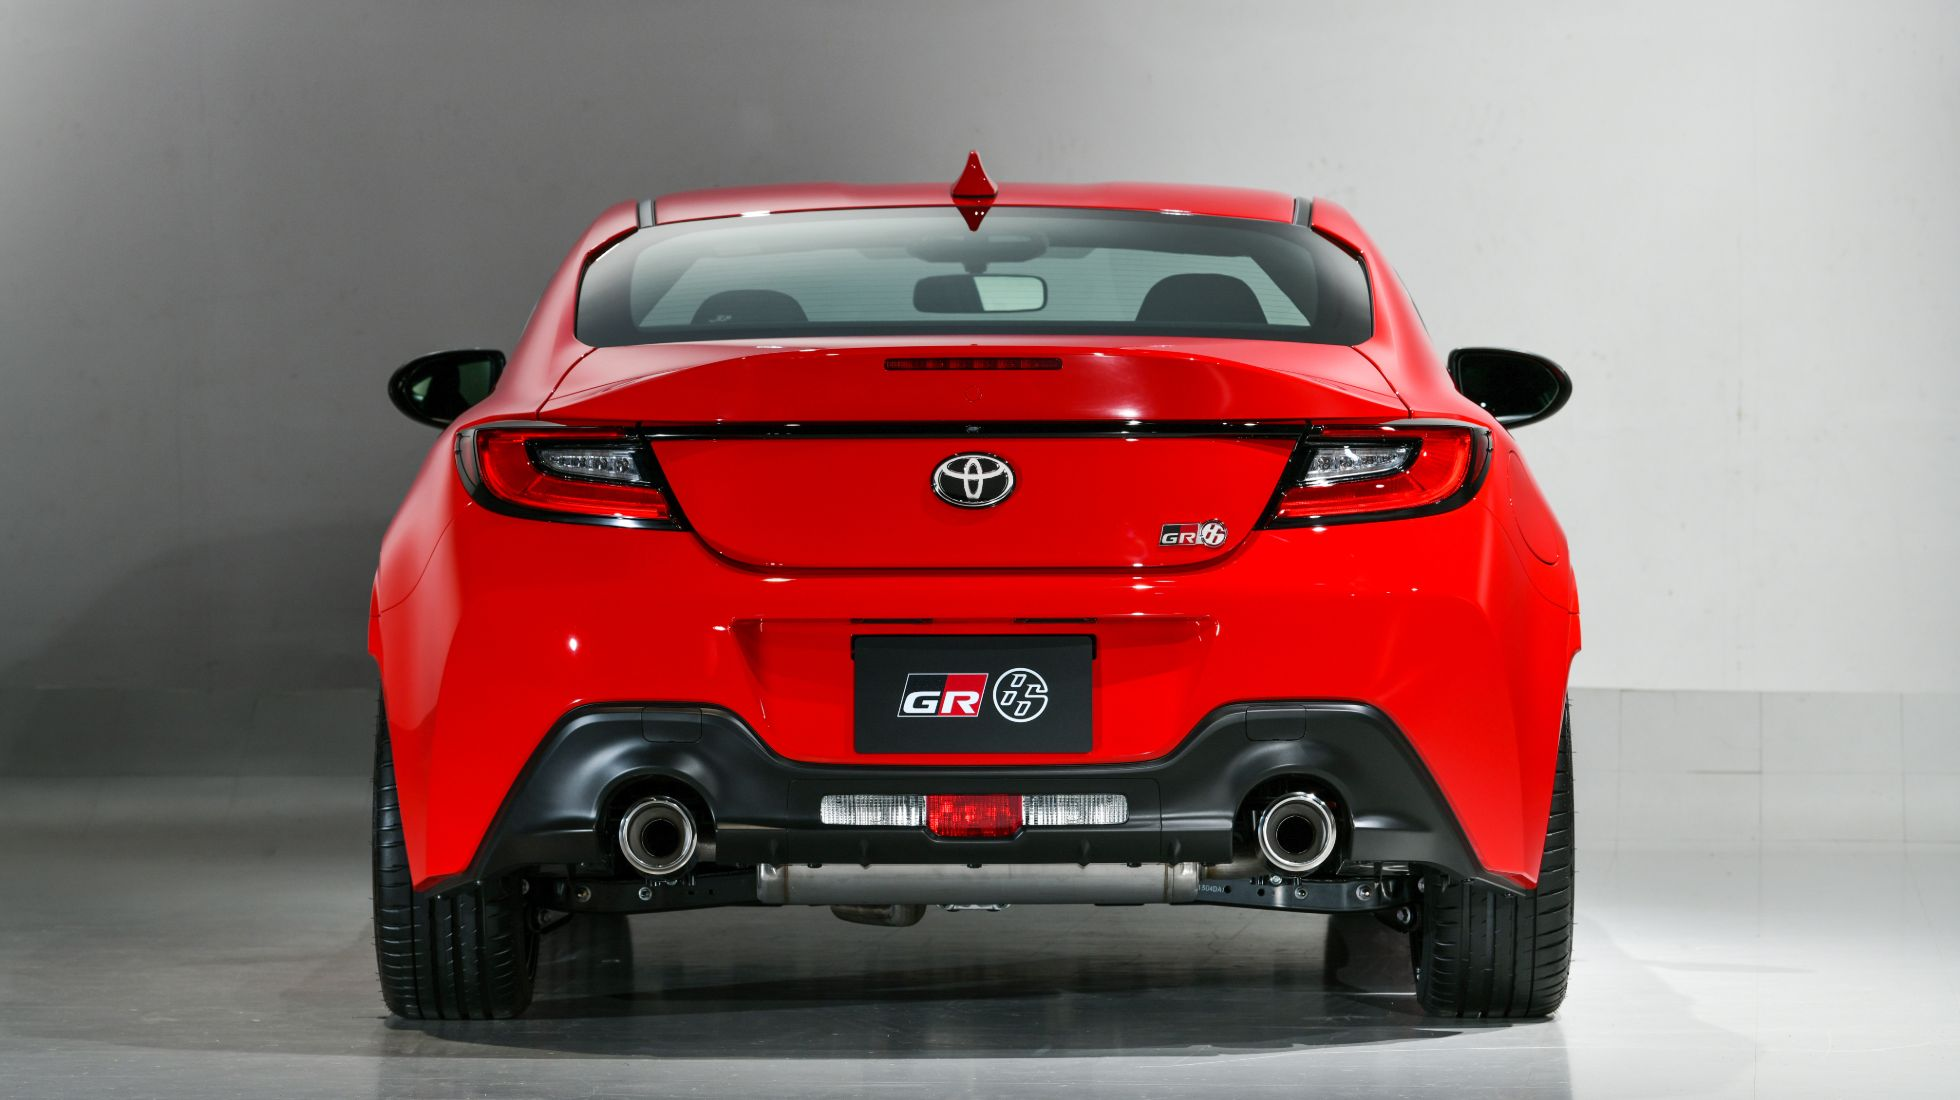 Toyota unveils its new GR 86 sportscar